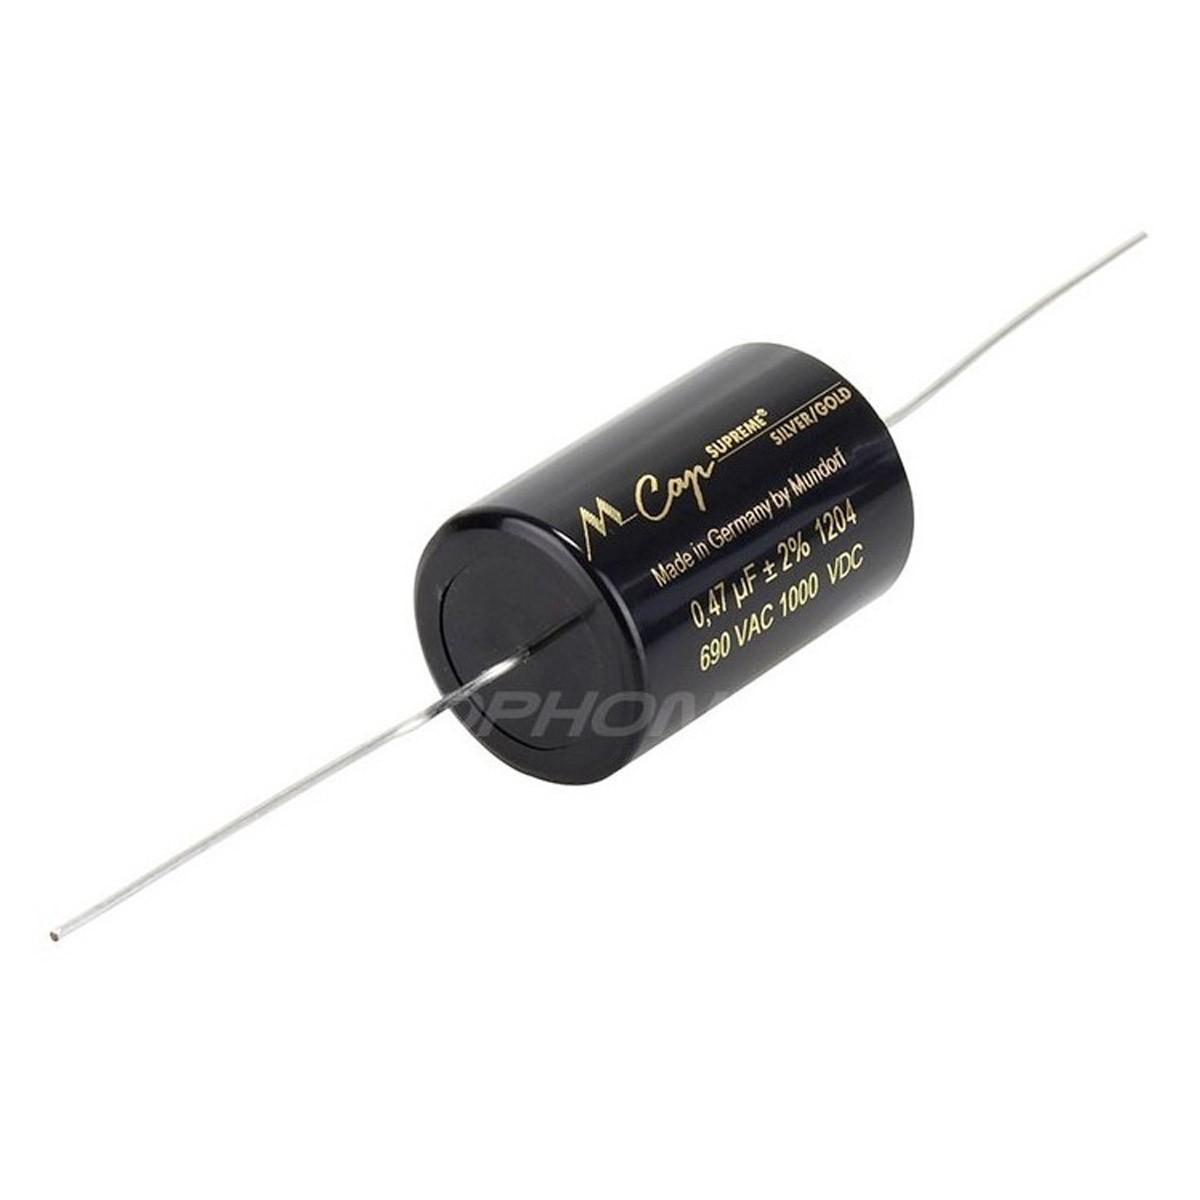 MUNDORF MCAP SUPREME SILVERGOLD Condensateur 1000V 0.15µF